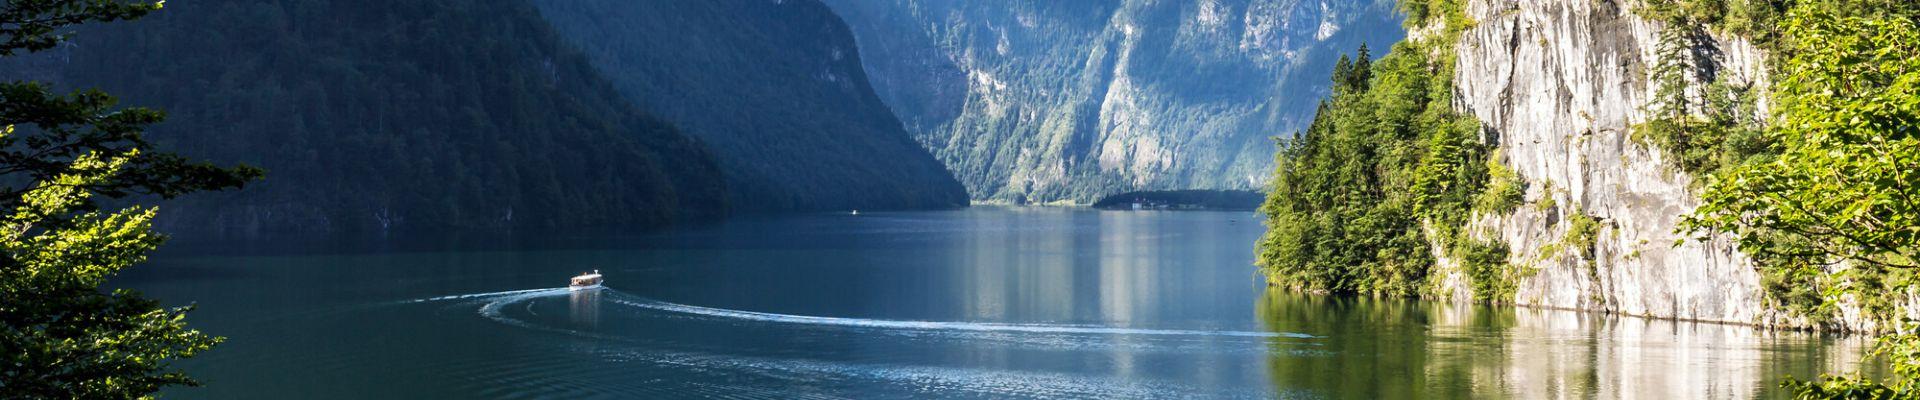 Nationalpark Berchtesgaden KMW